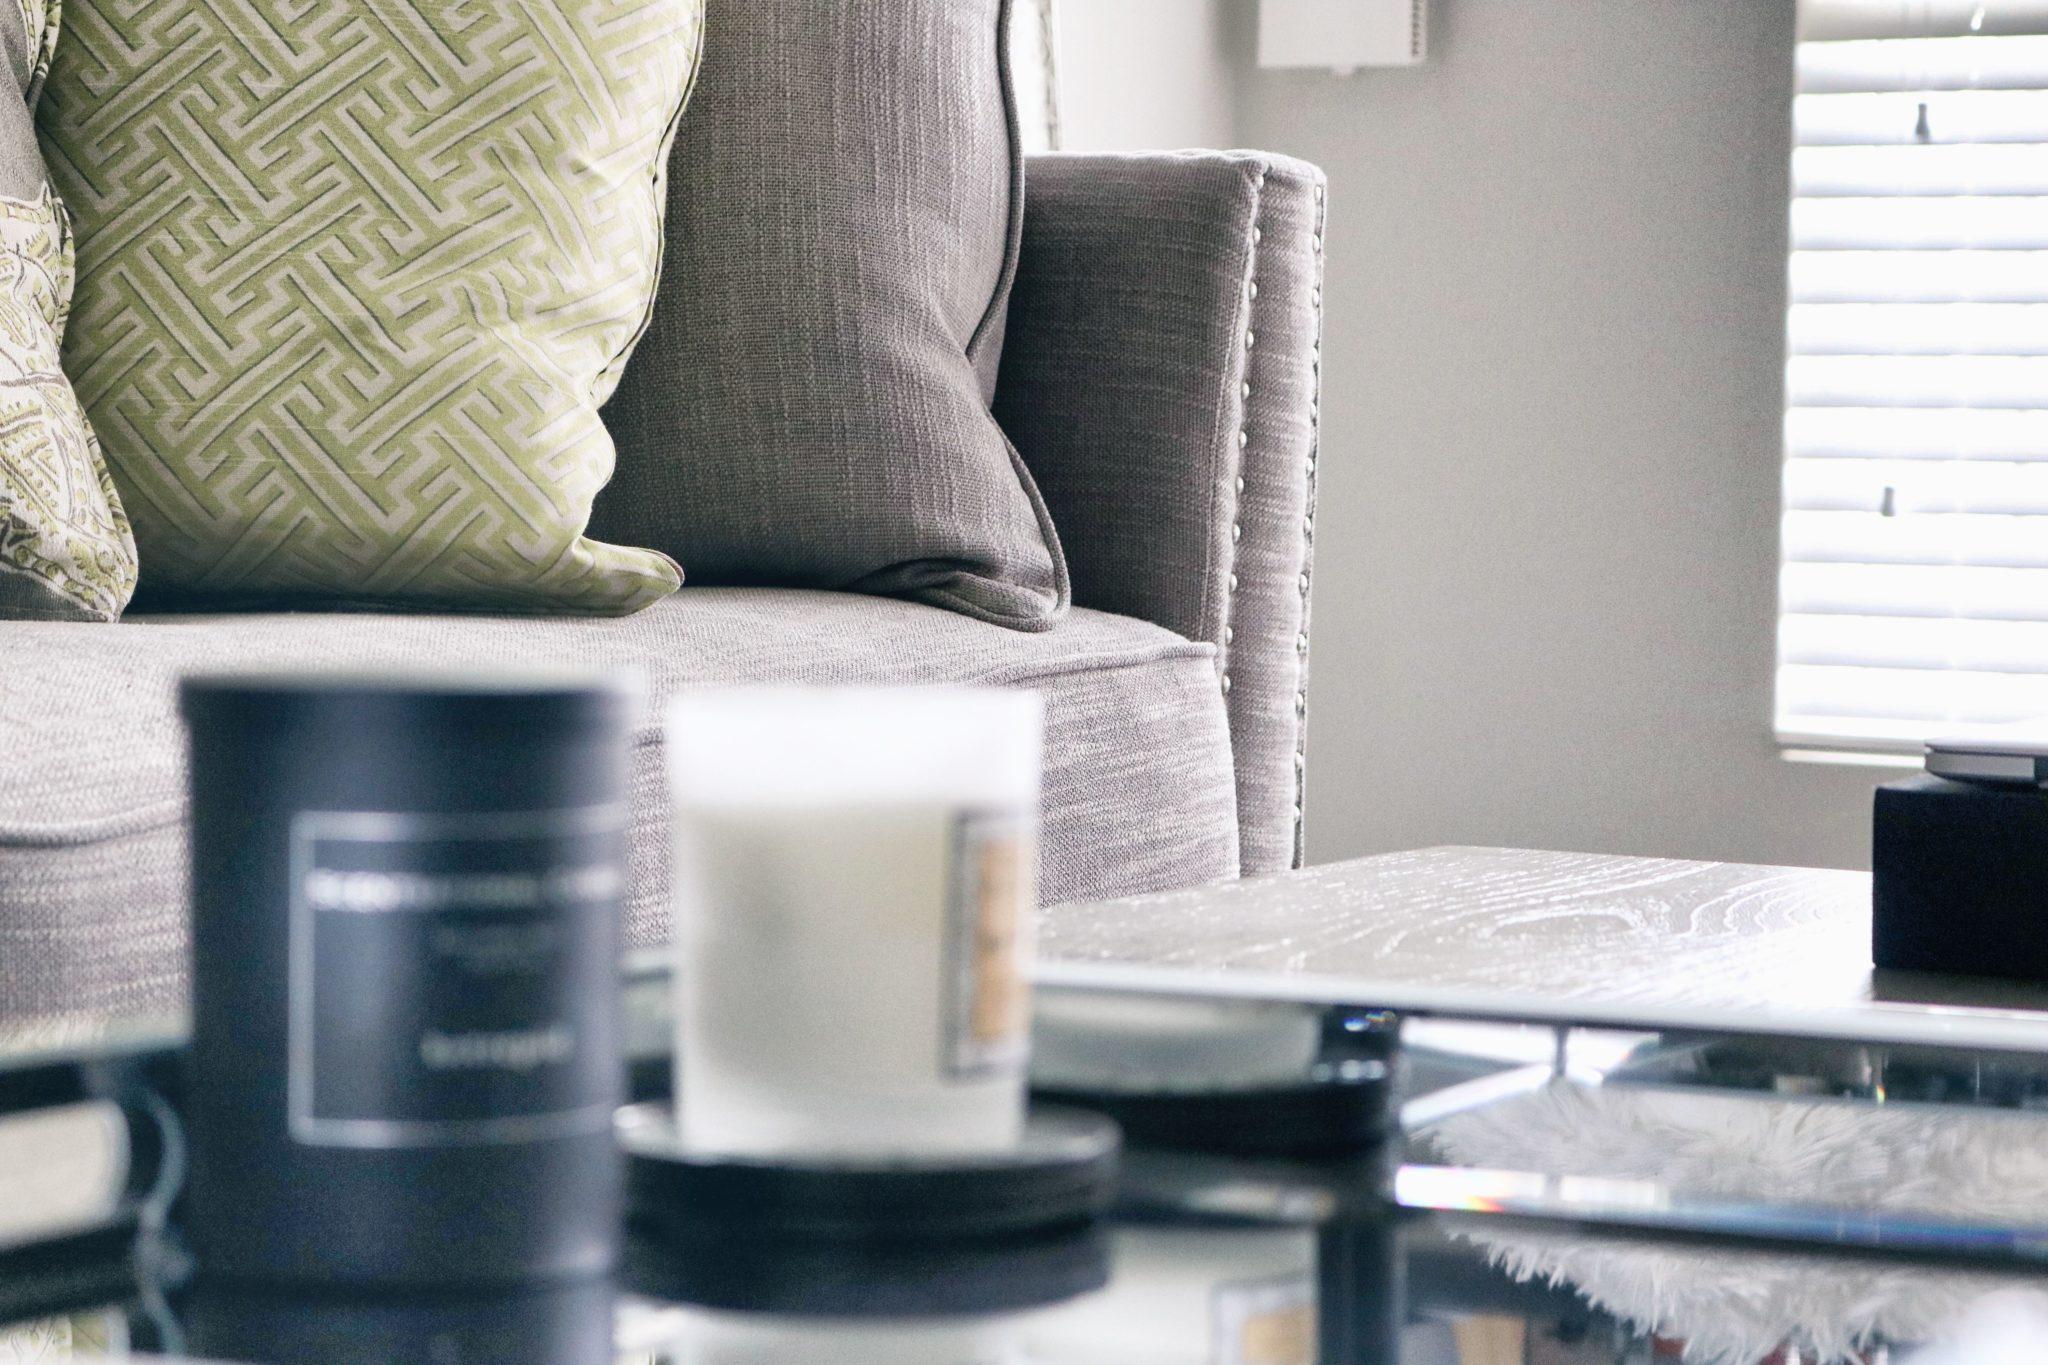 Sneak Peak of My New Living Room! – TAYLOR CUQUA